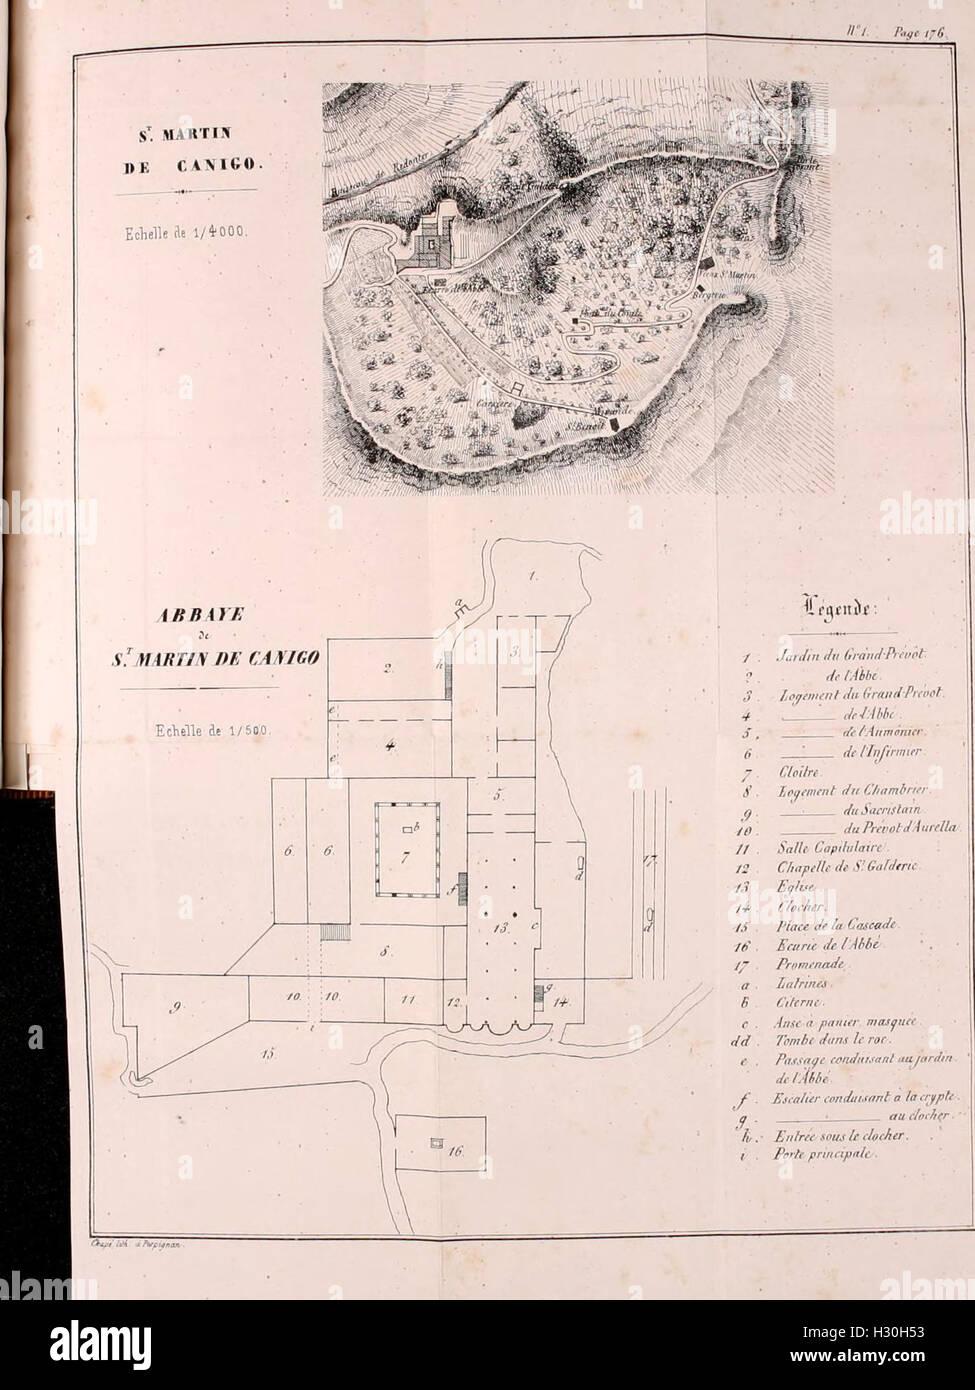 Pyrenees-orientales 1878 Old Antique Map Plan Chart PyrÉnÉes-orientales Art